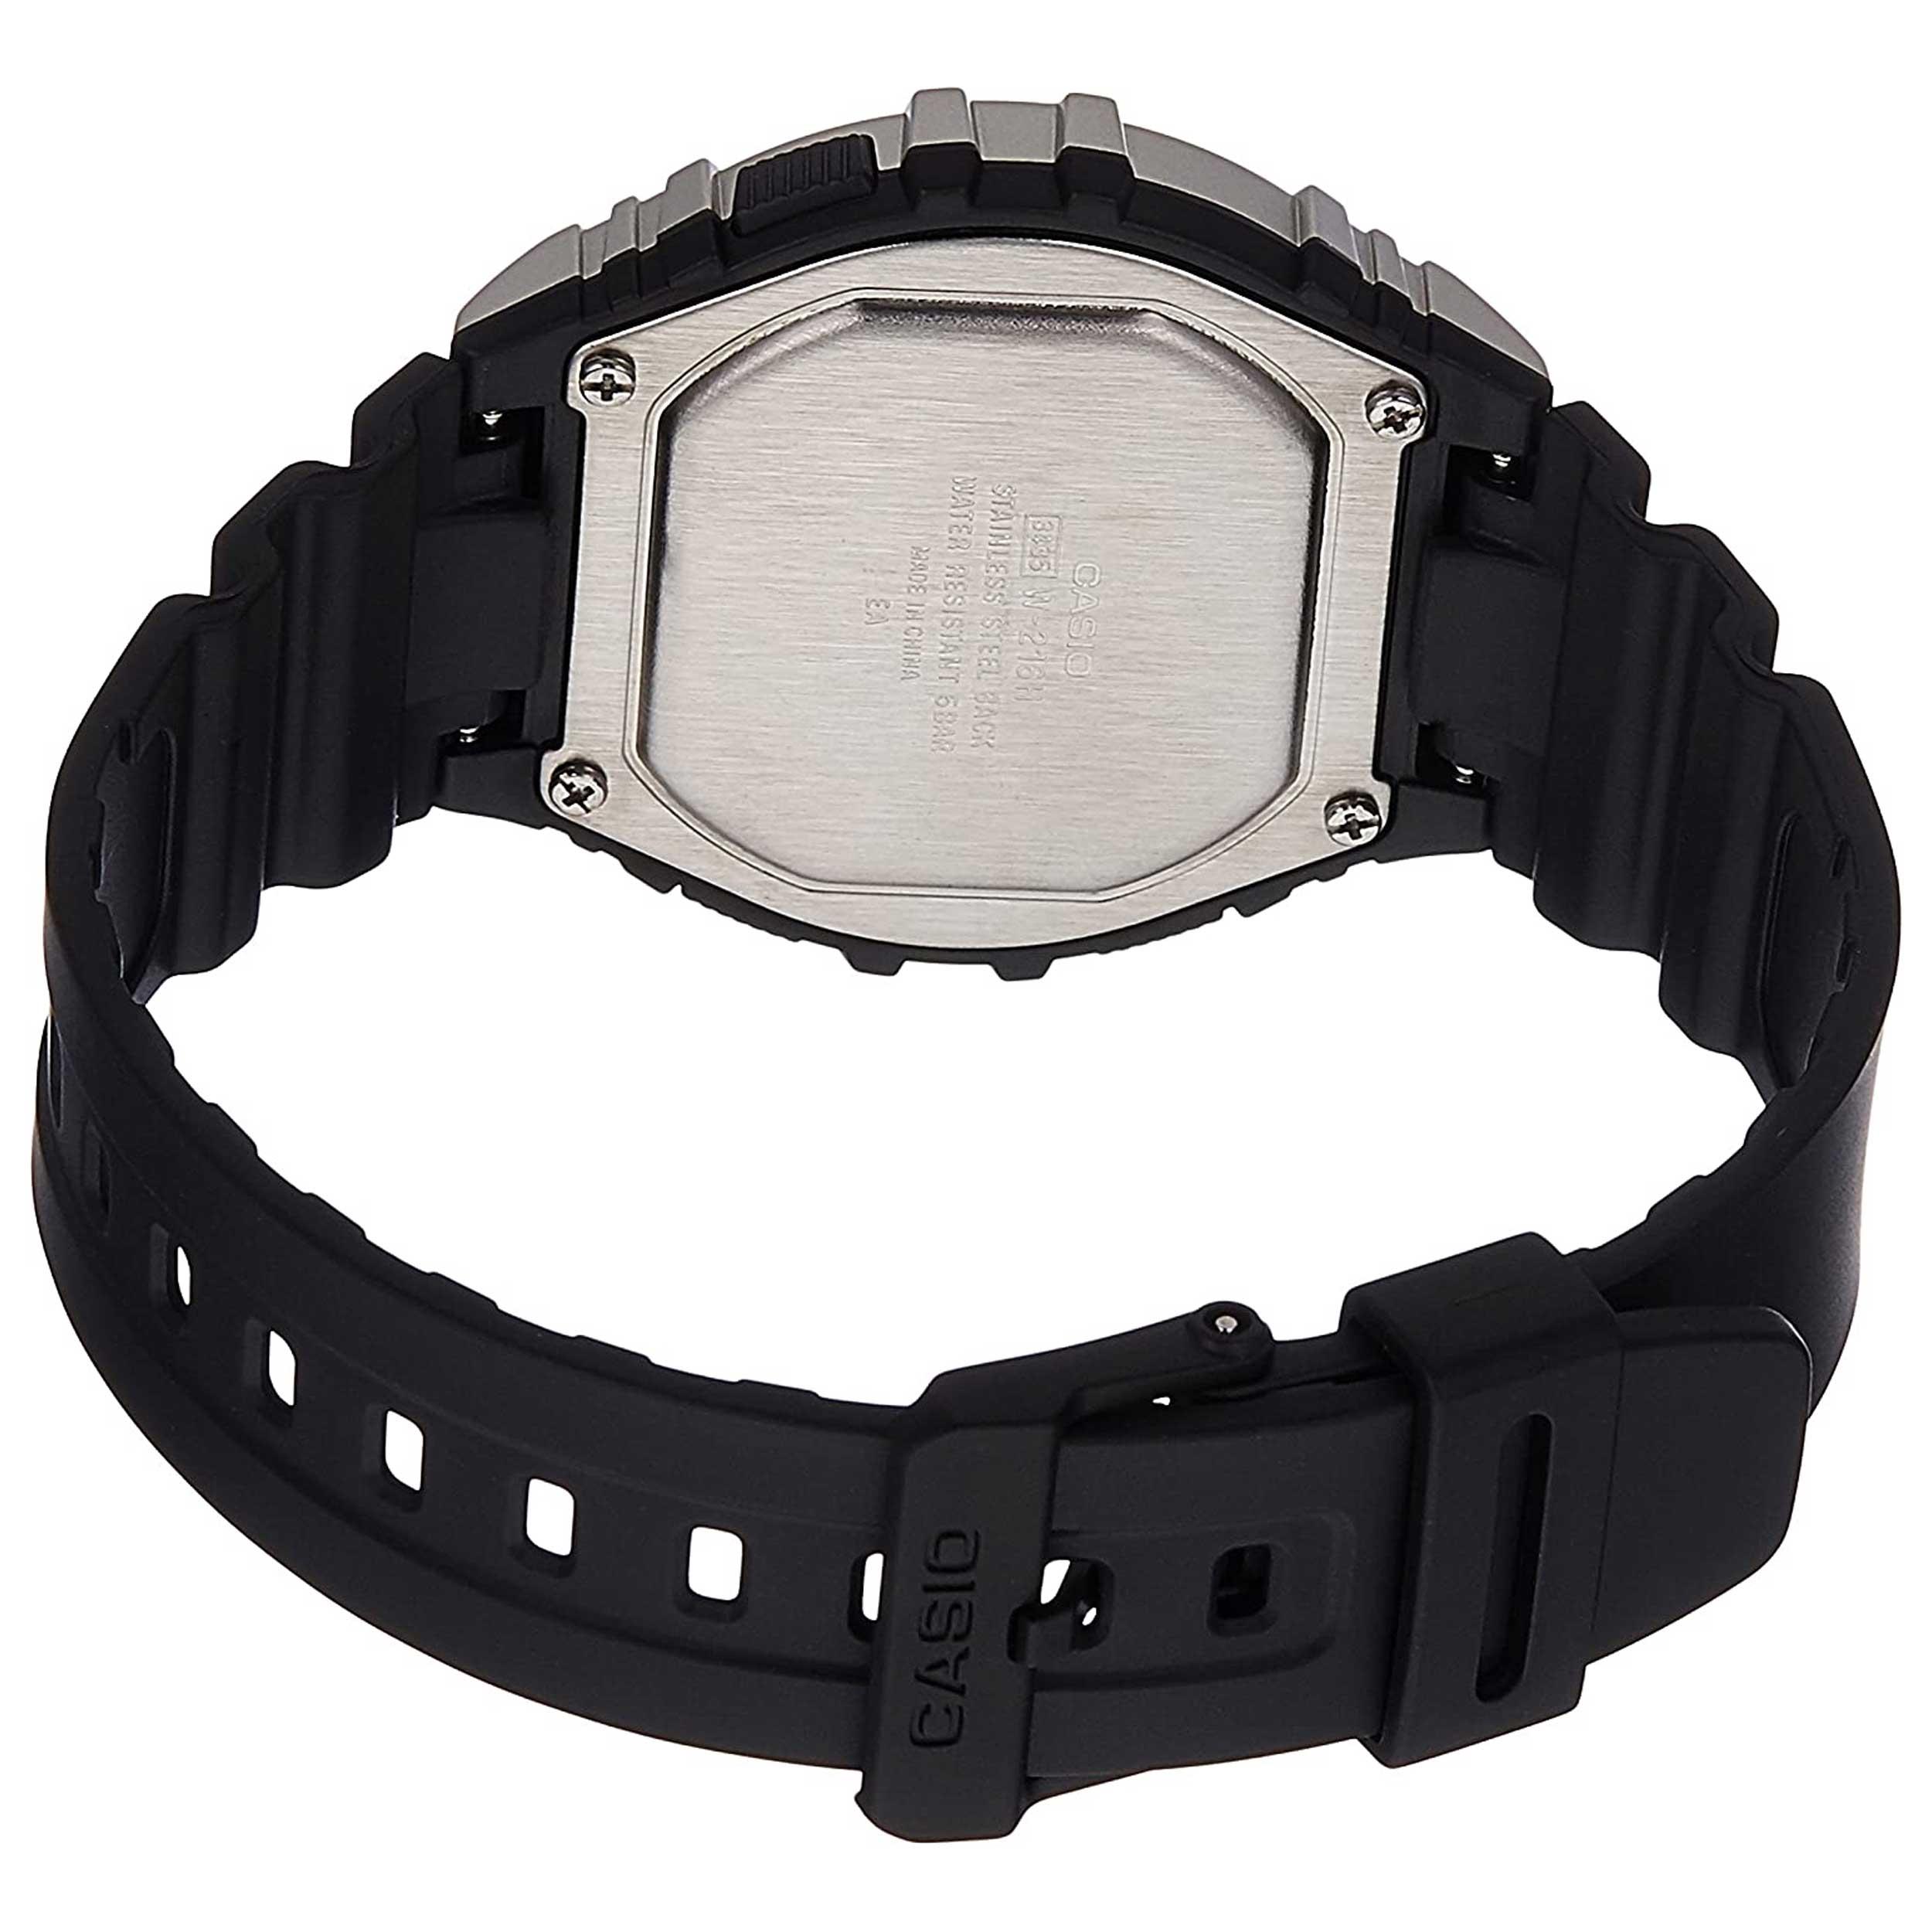 ساعت مچی دیجیتال مردانه کاسیو مدل W-216H-1CVDF             قیمت